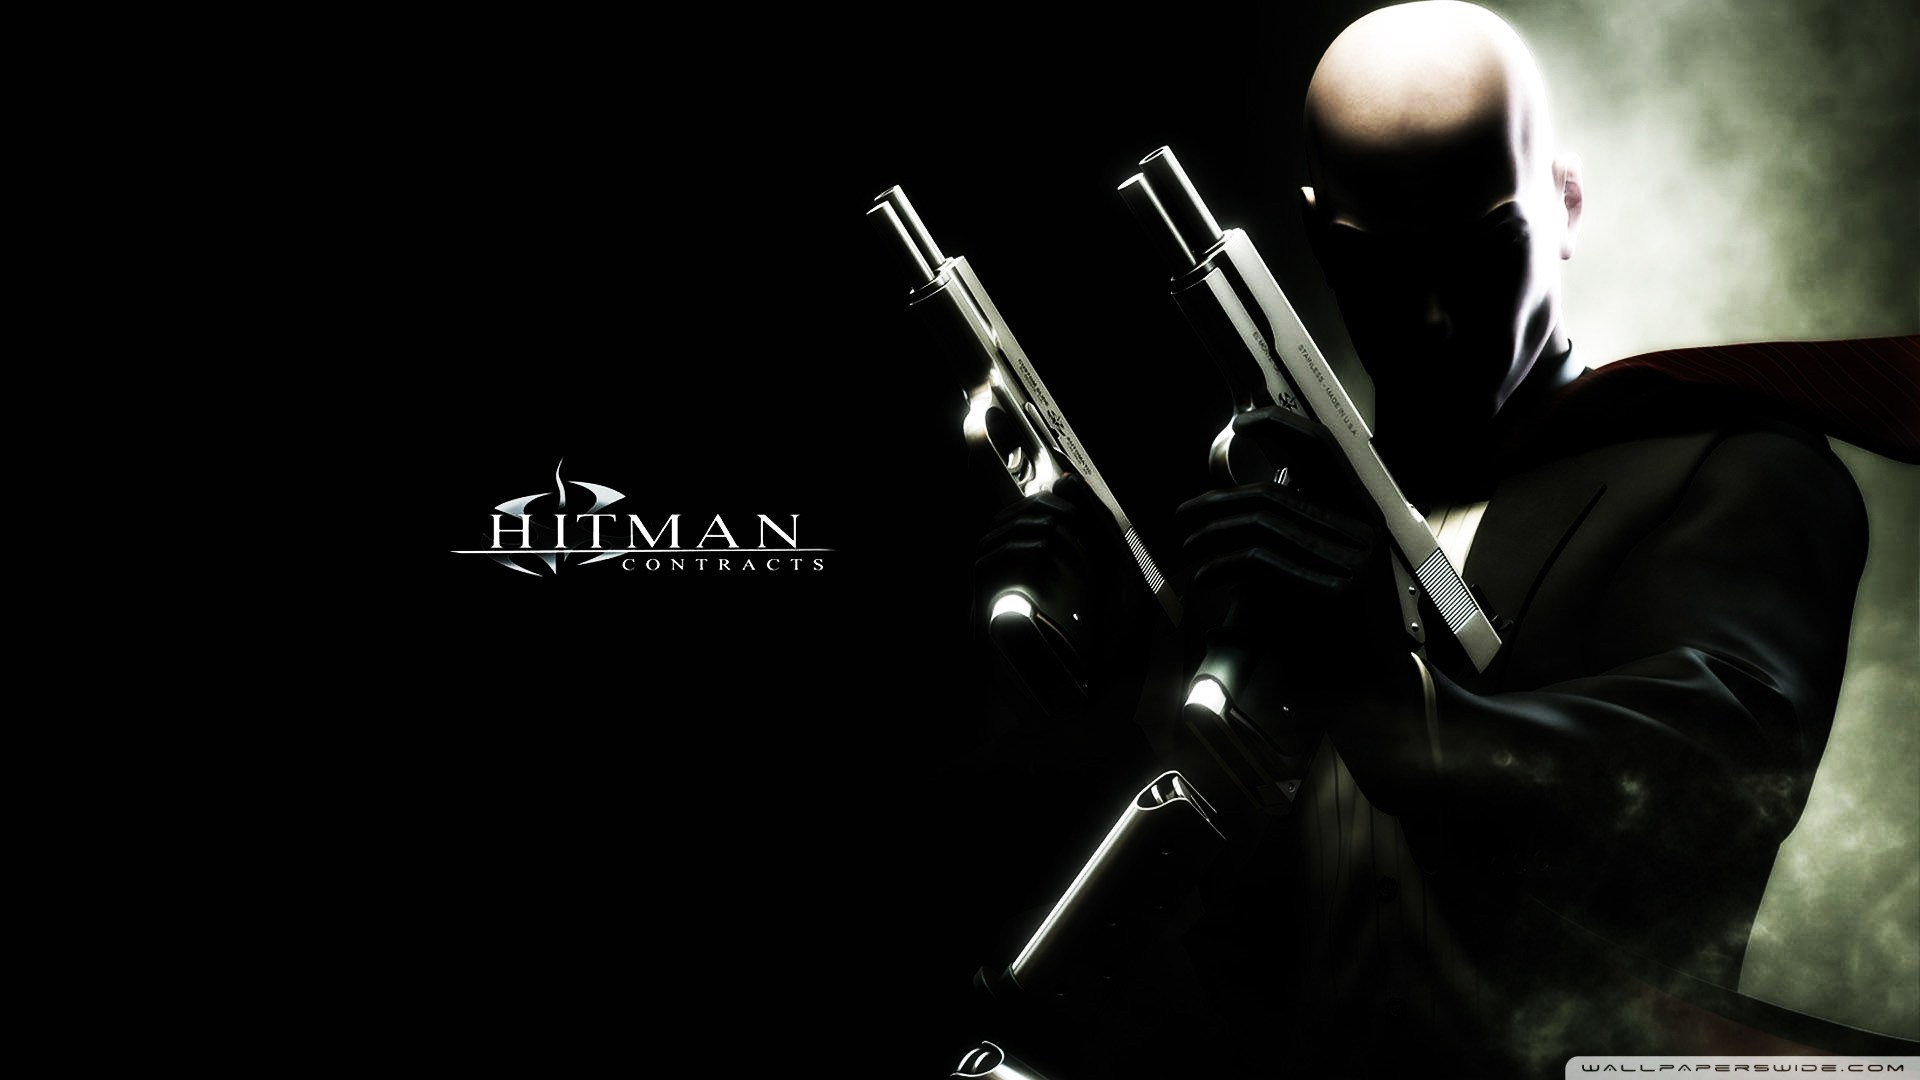 Agent 47 Hitman Stealth HD Wallpaper Background 16837 Wallur 1920x1080